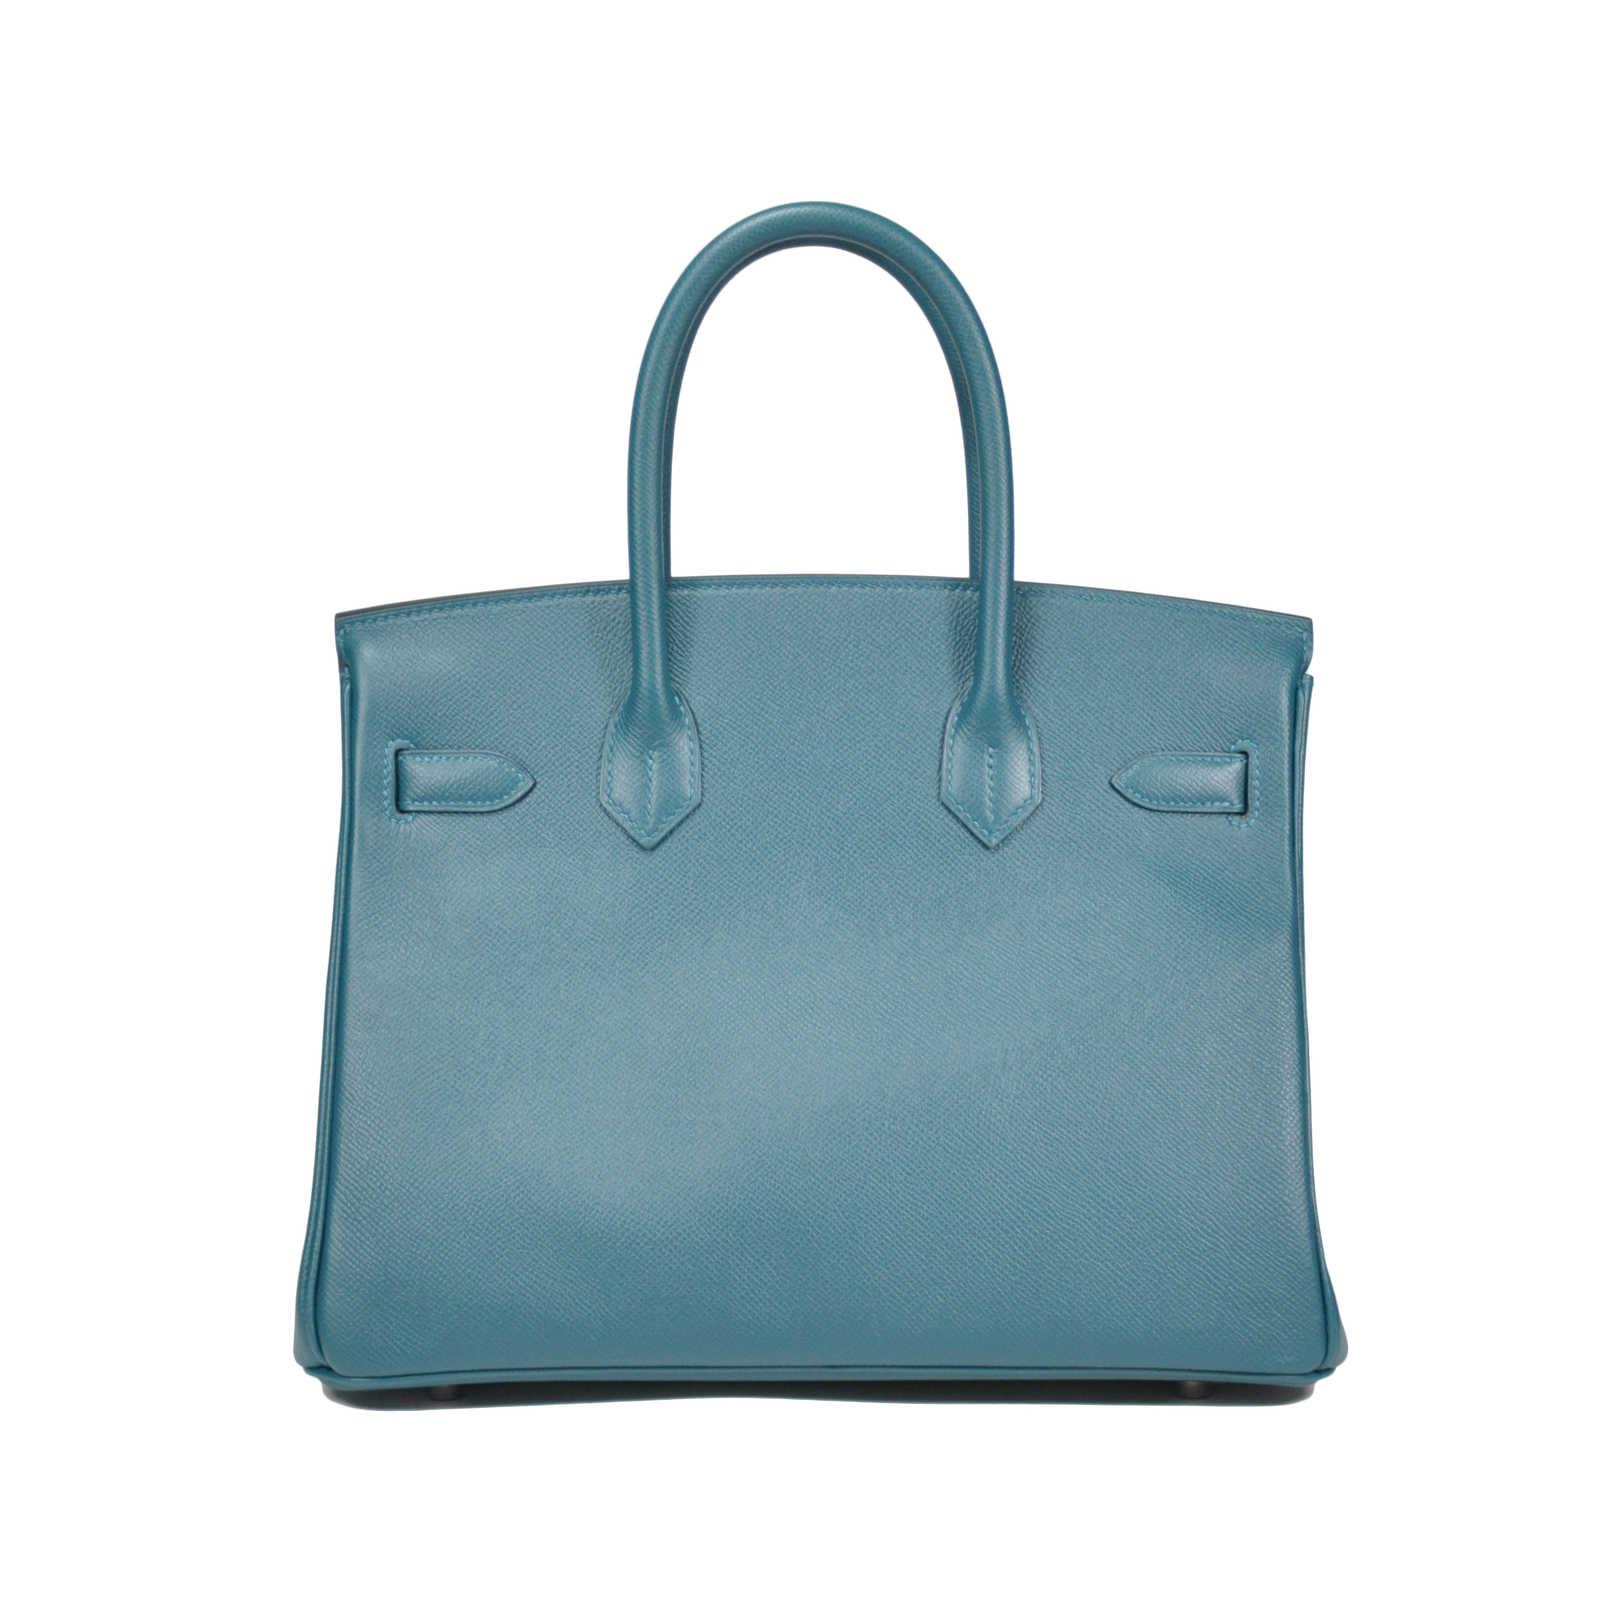 a0c8f36504 ... Authentic Second Hand Hermès Colvert Birkin 30 (PSS-145-00070) -  Thumbnail ...